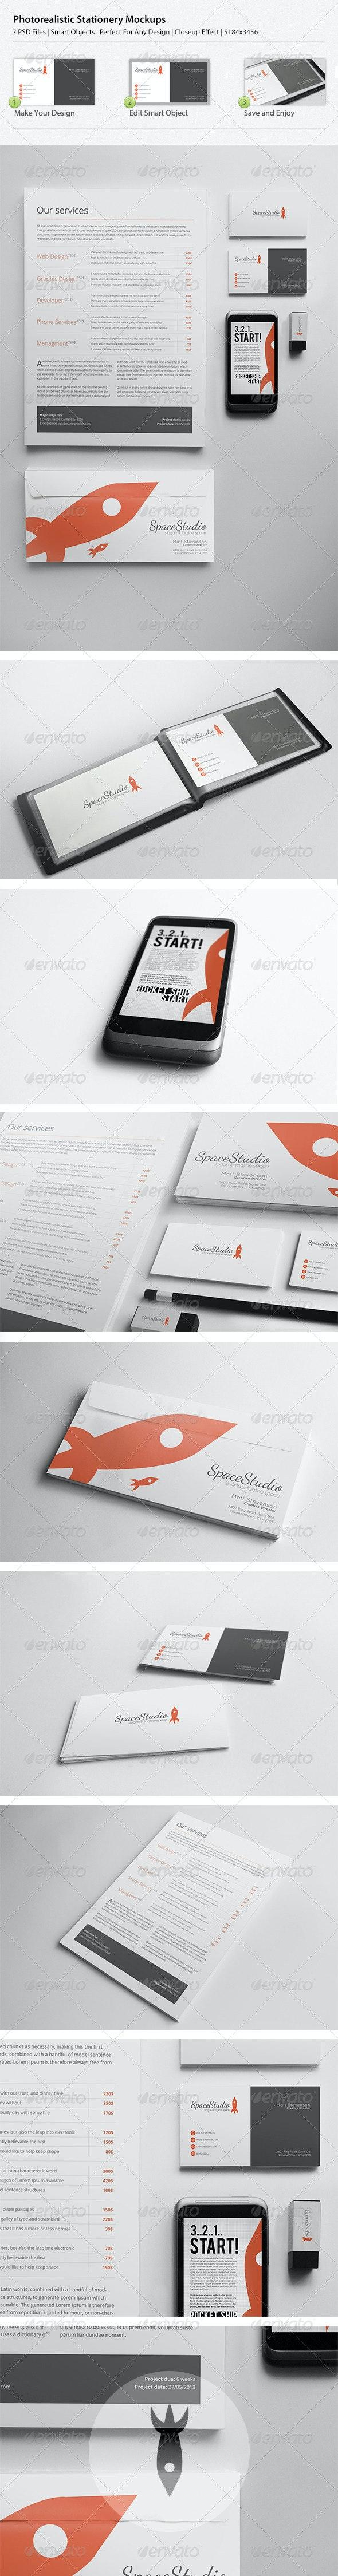 Photo Realistic Stationary/Brand Identity Mockups - Print Product Mock-Ups